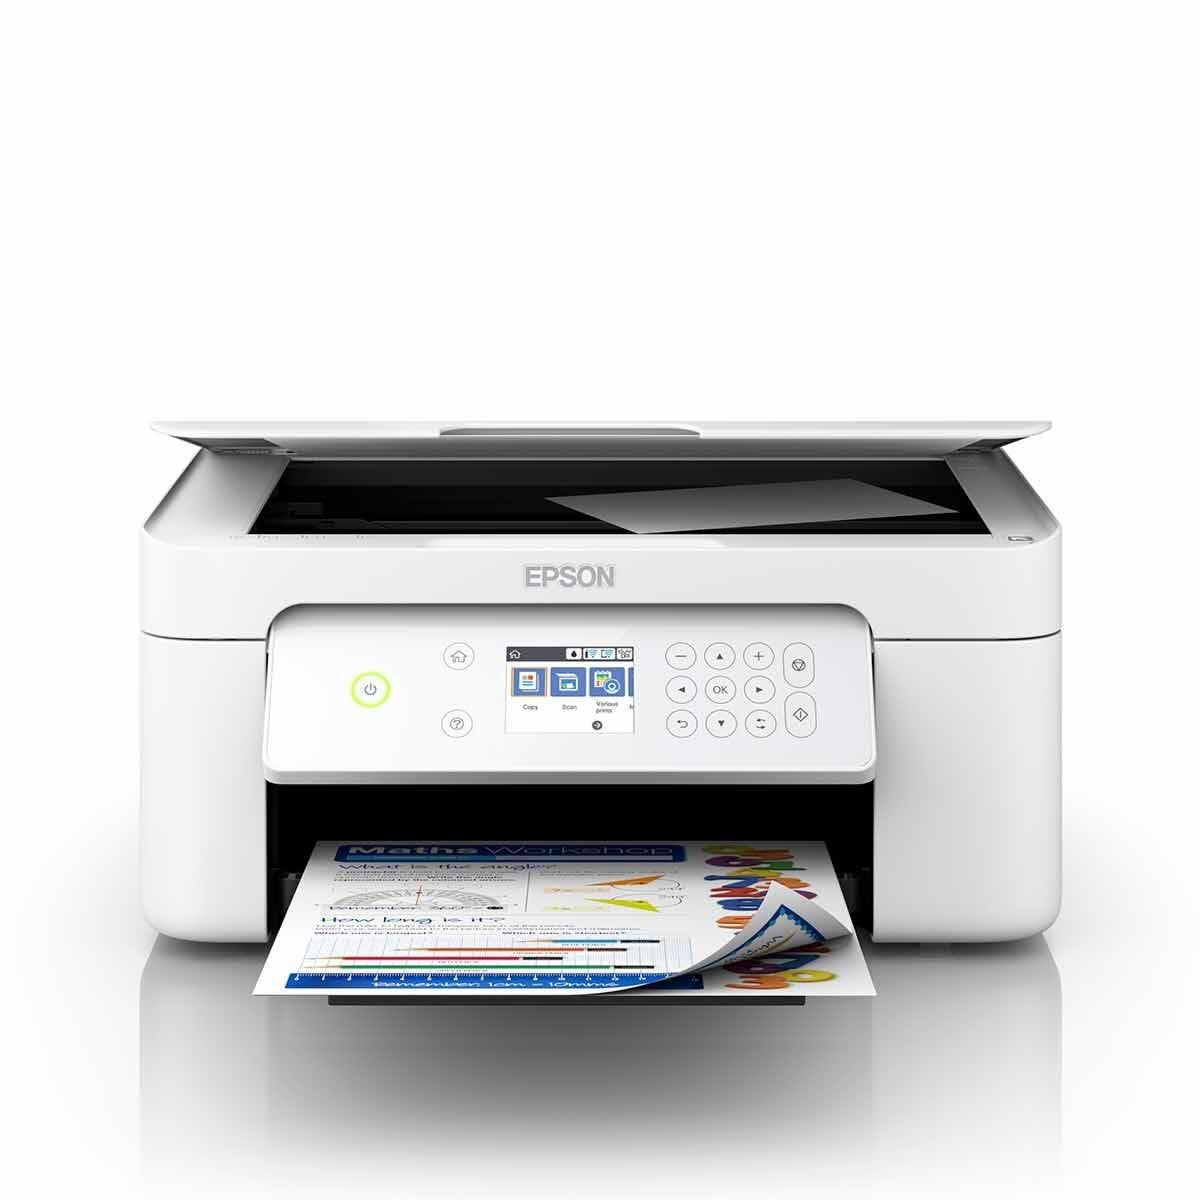 Epson Expression Home XP-4105 3-in-1 Wireless Inkjet Printer White